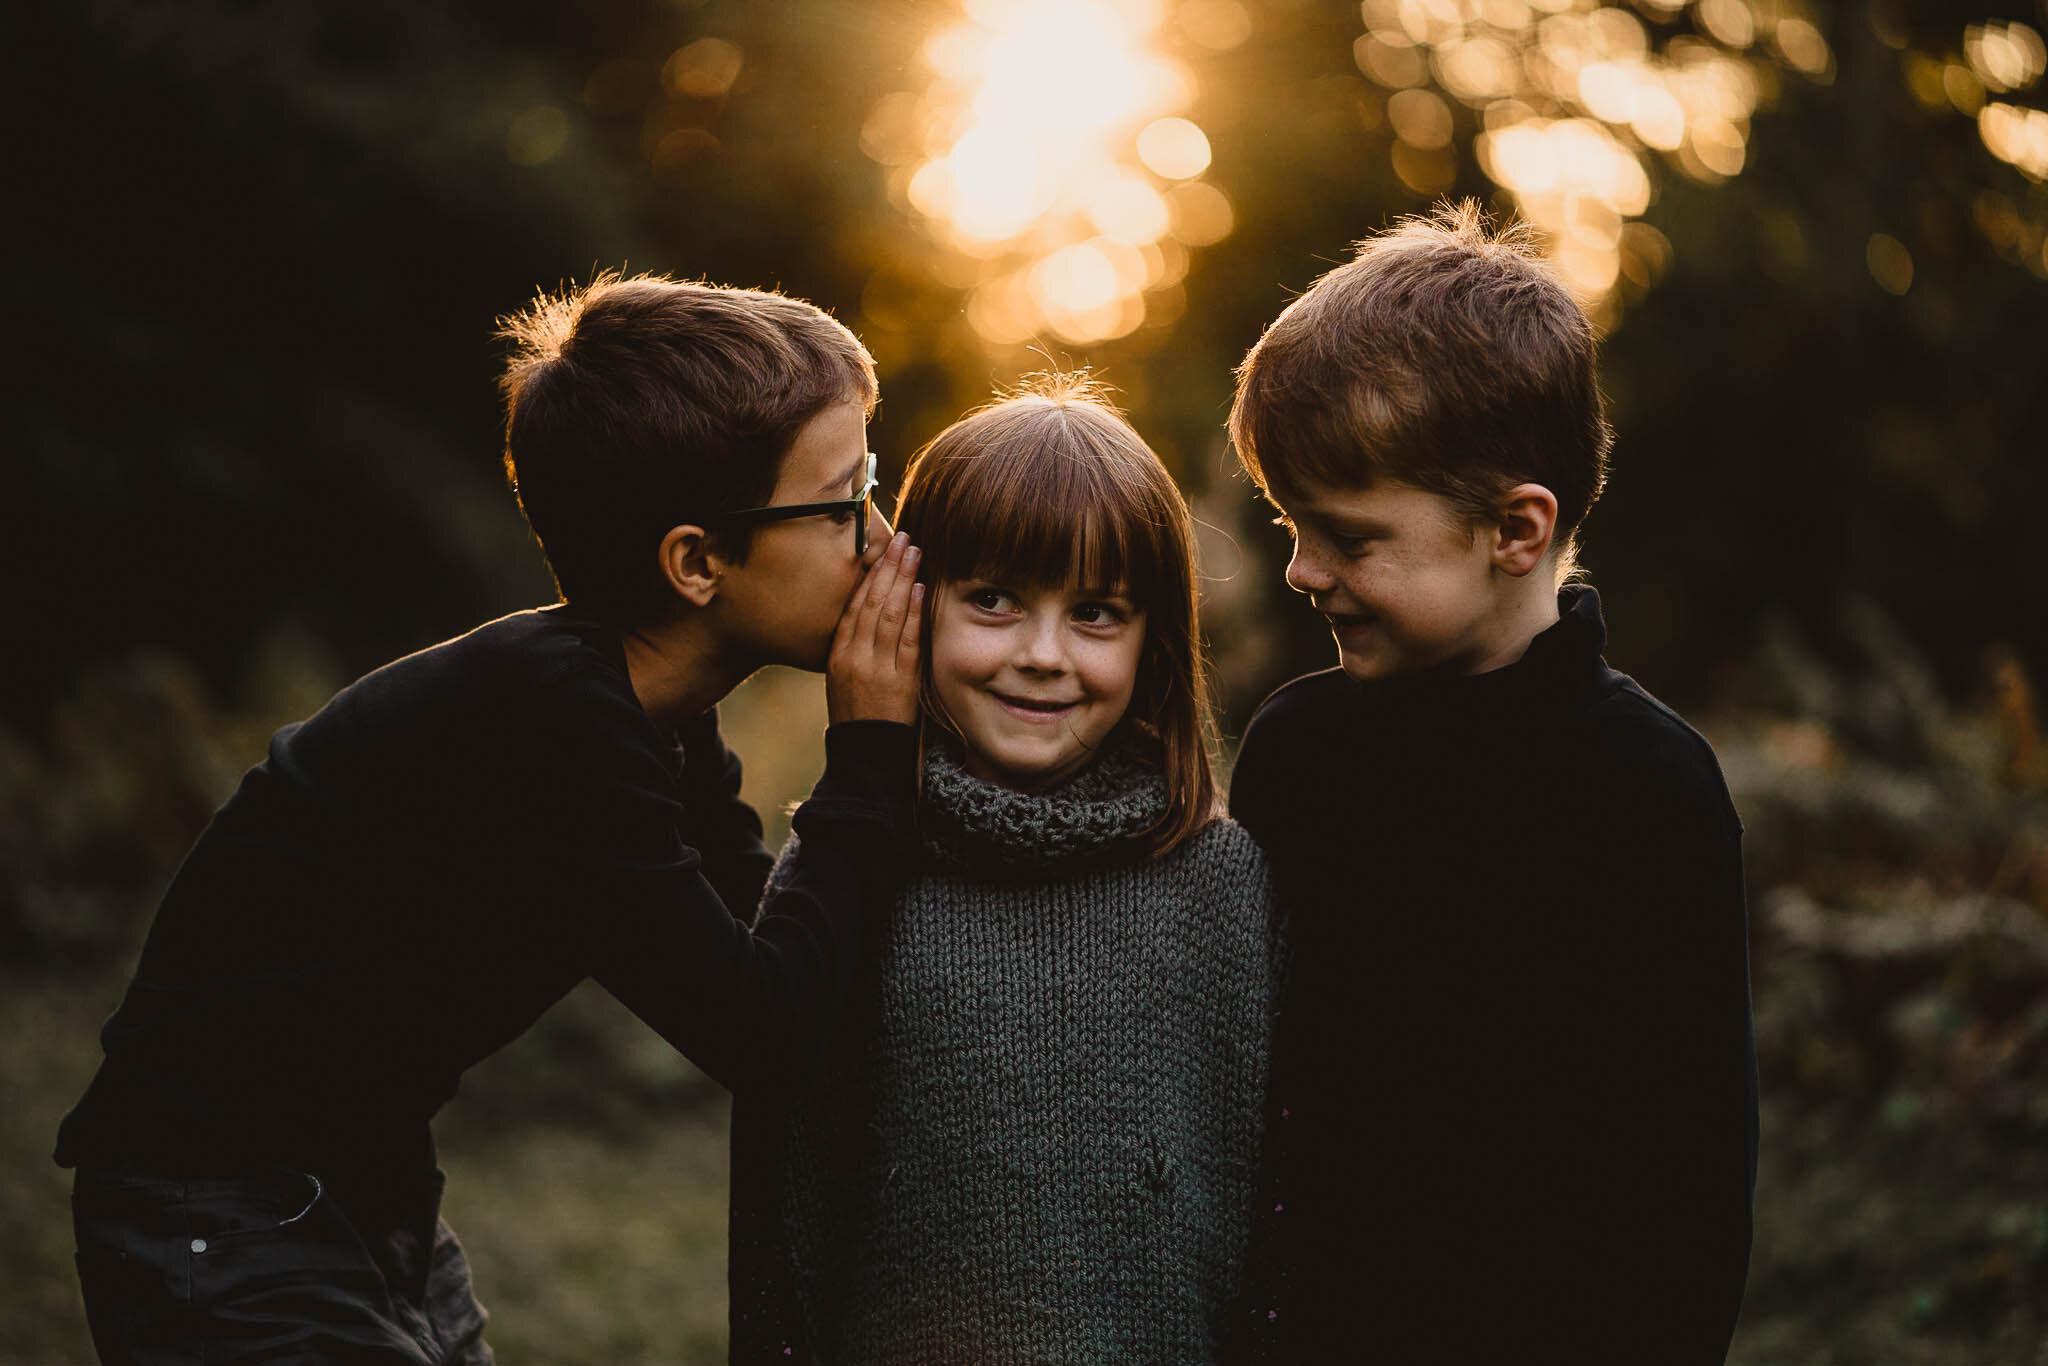 FAMILYPHOTOGRAPHERSUSSEX